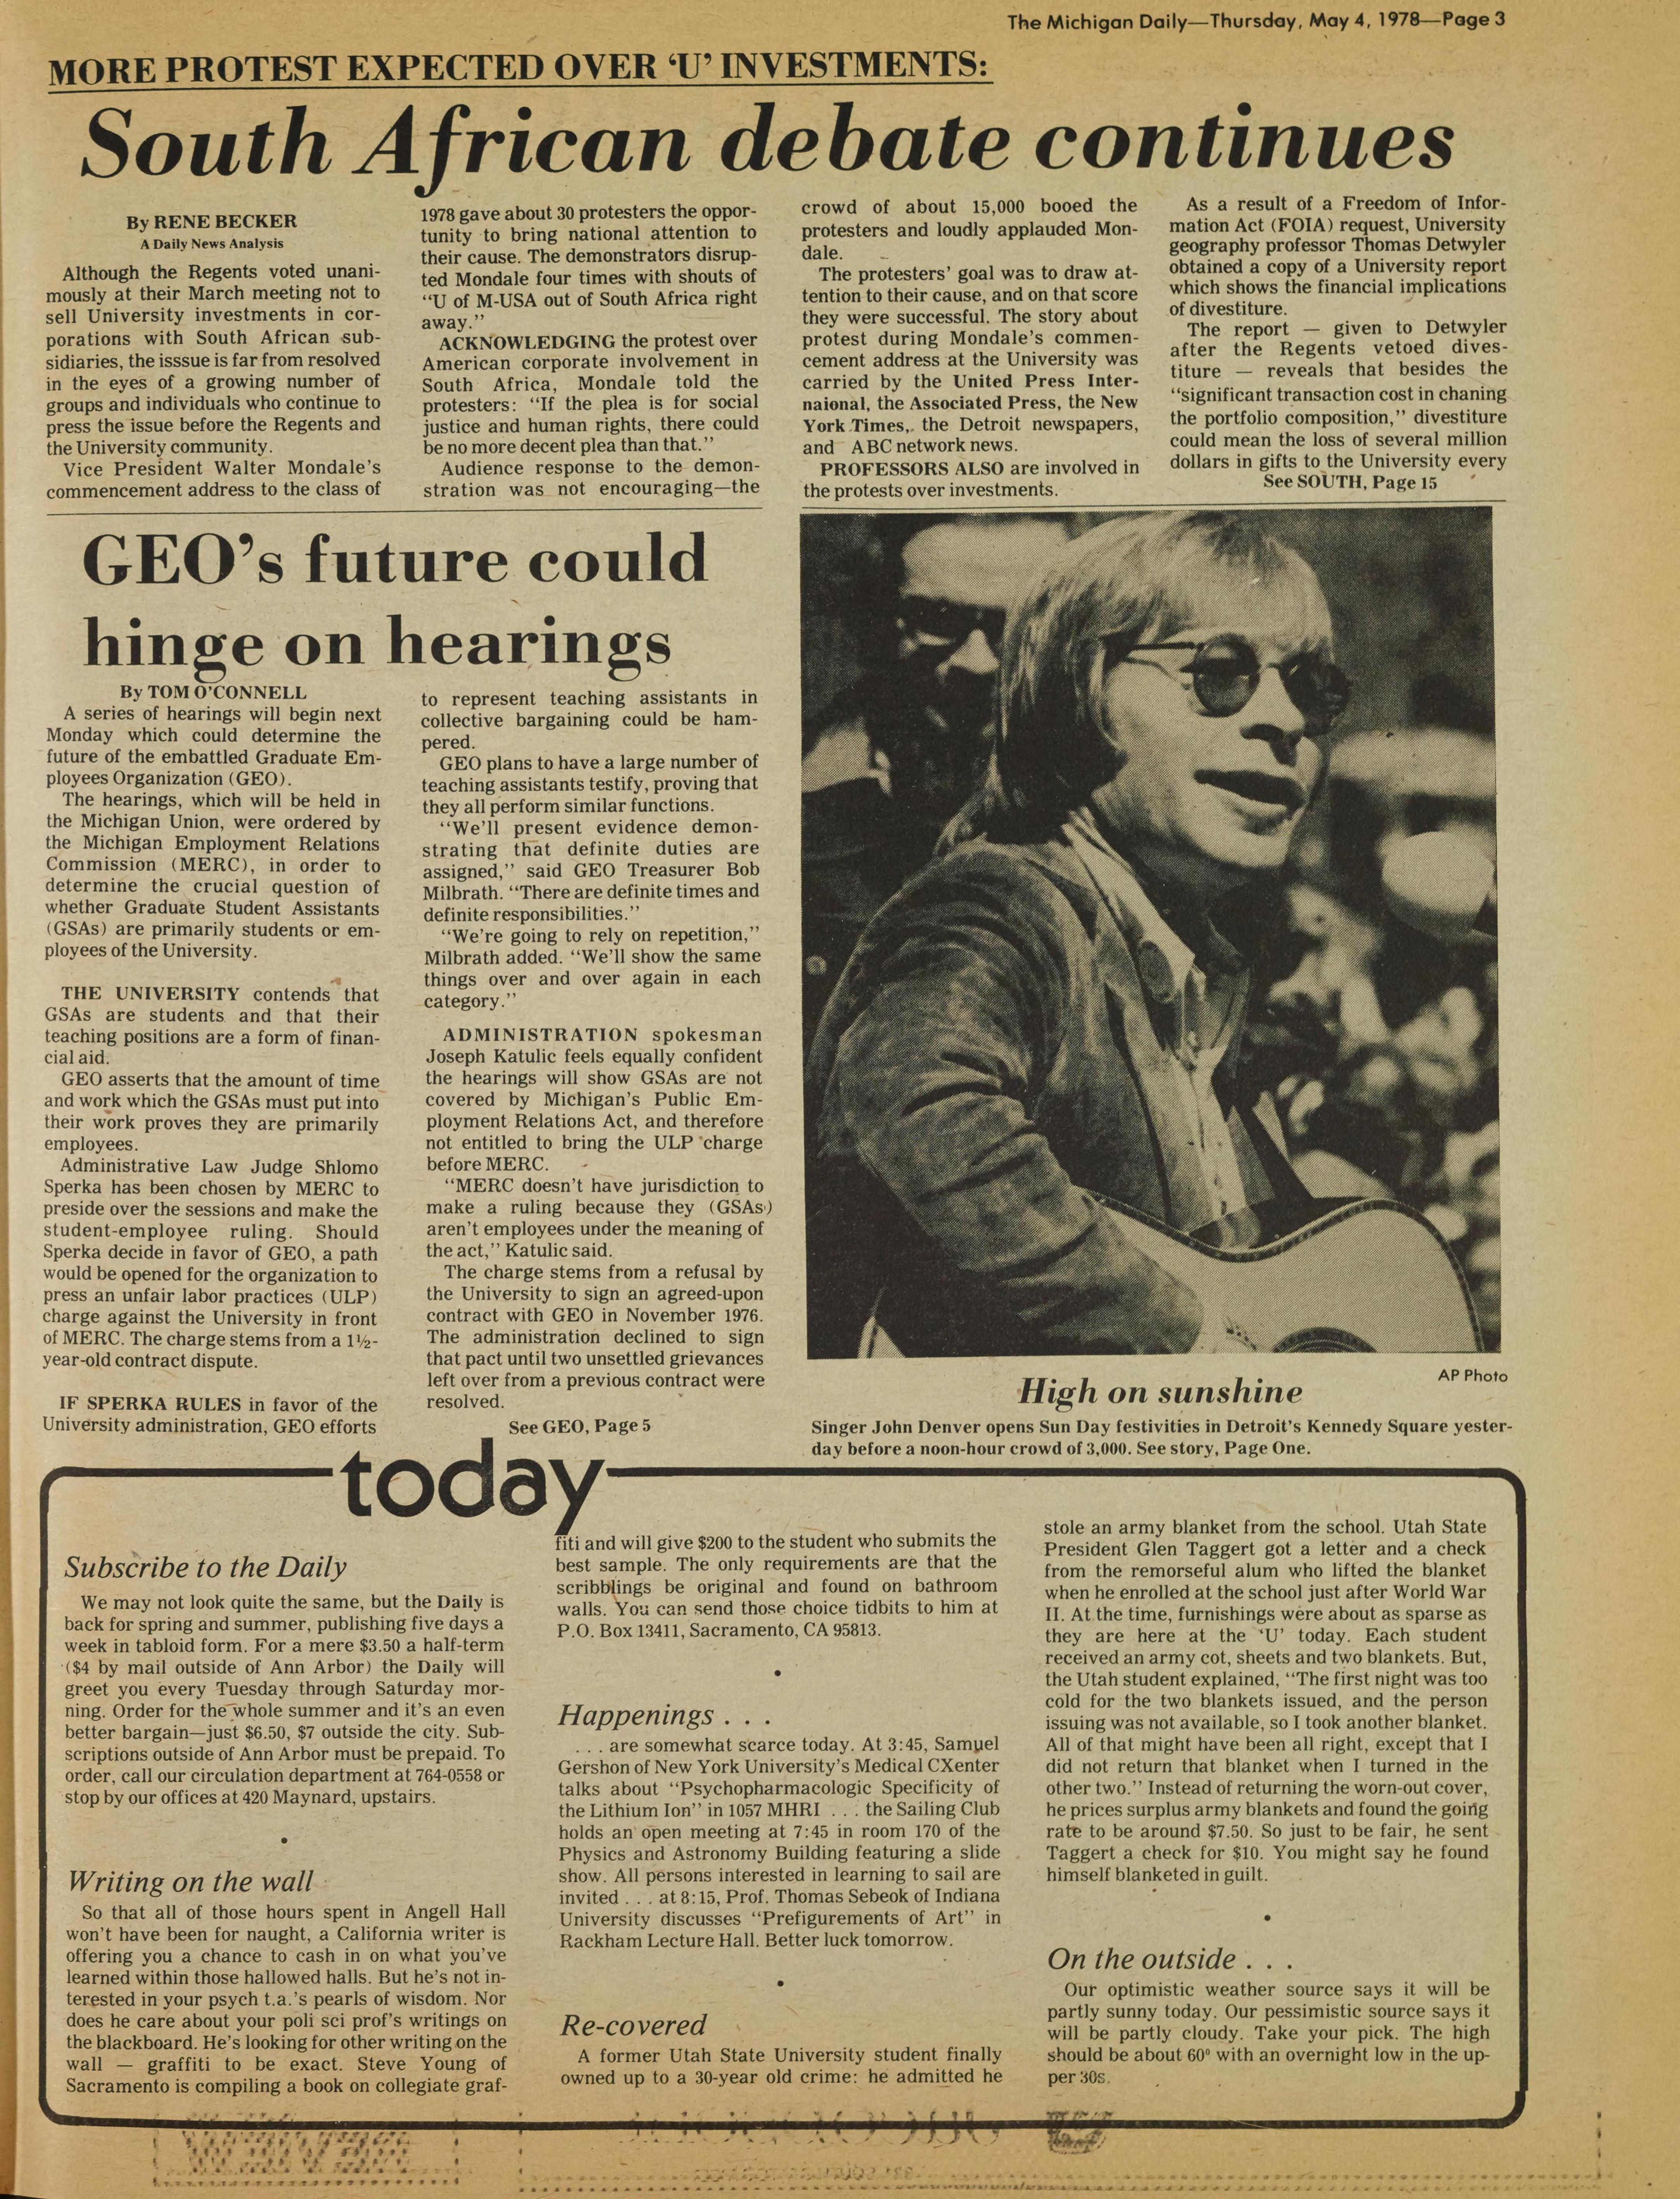 Michigan Daily Digital Archives May 04 1978 Vol 88 Iss 2 Just Sampel Download This Page